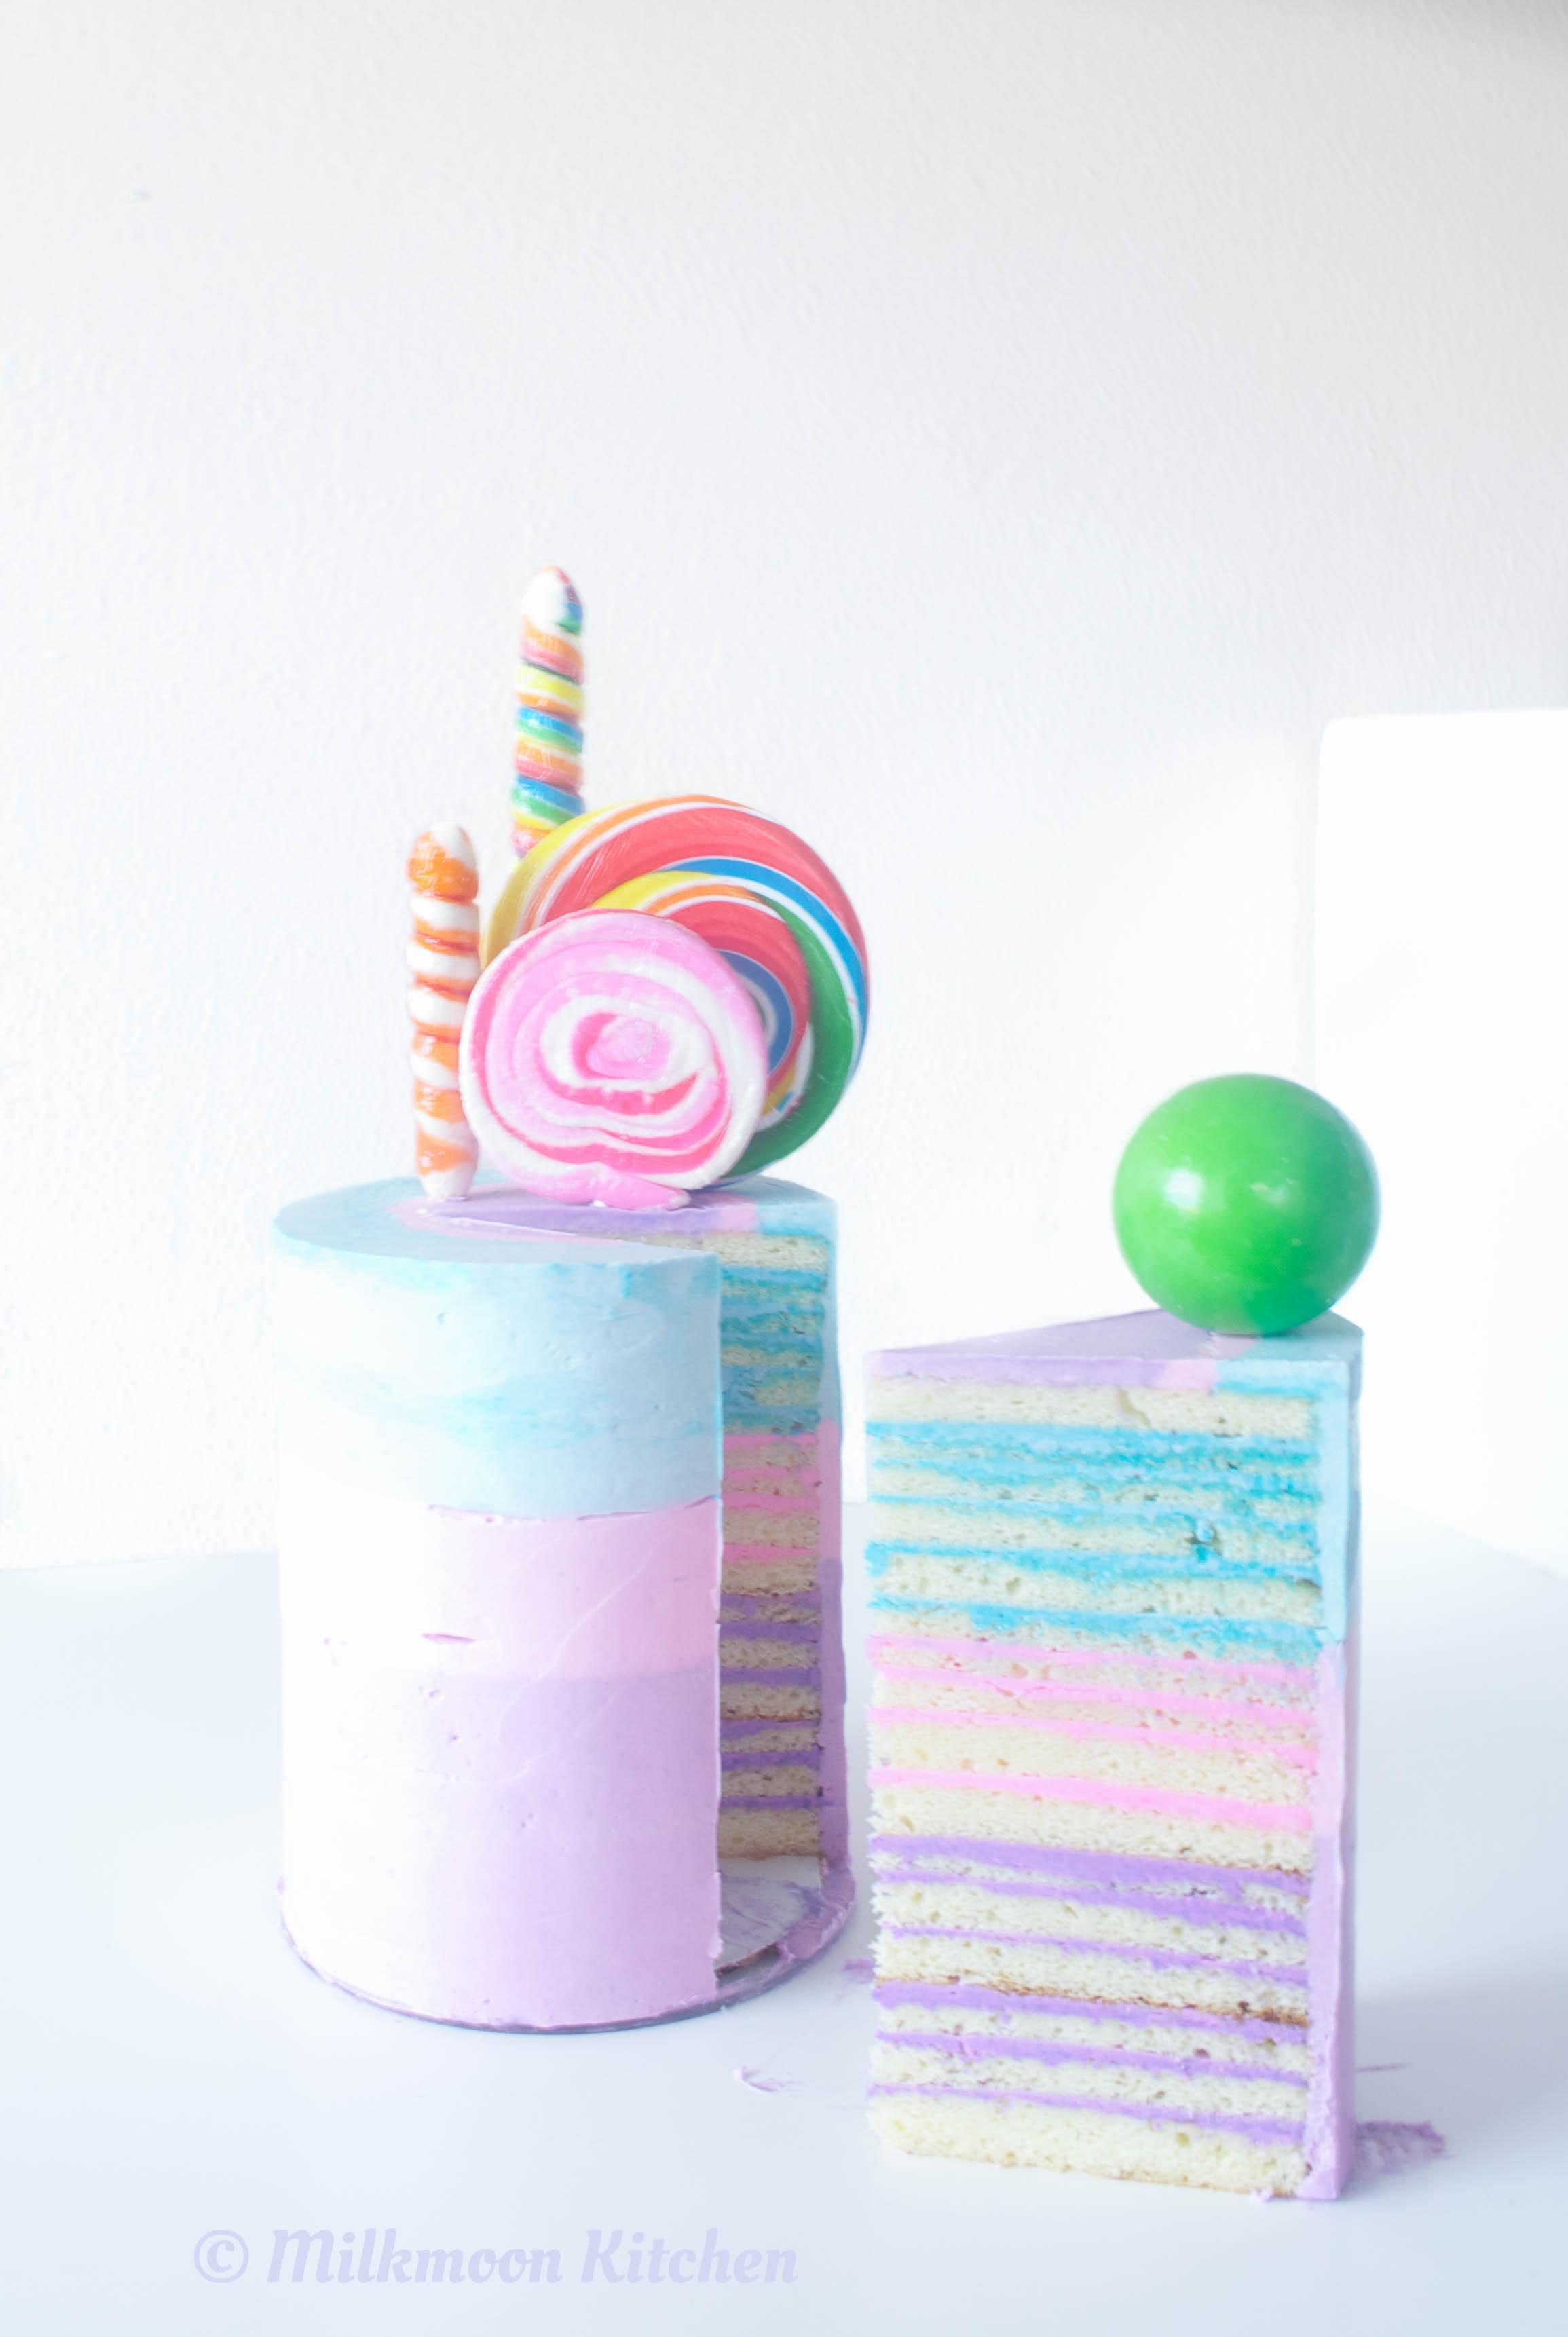 Candy Cake Edited (2 of 7).jpg